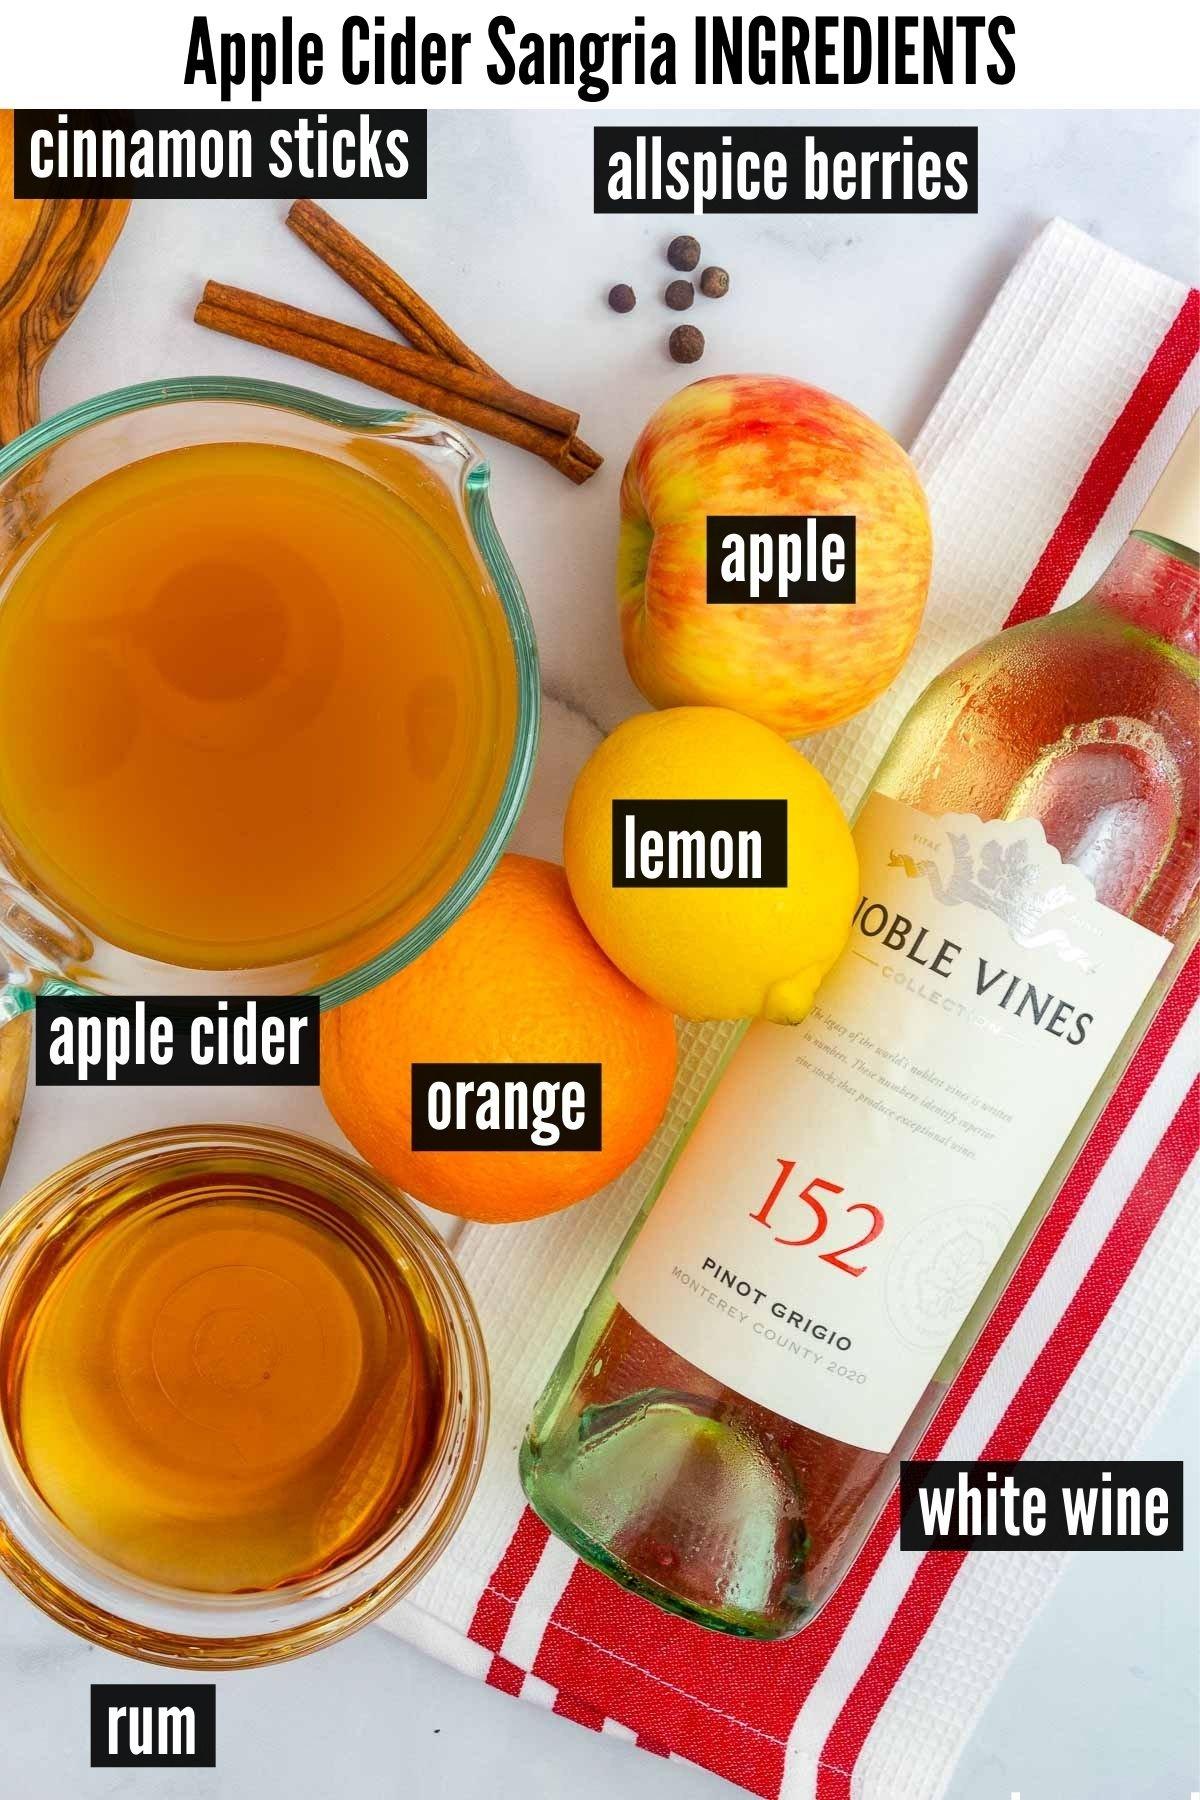 apple cider sangria ingredients labelled